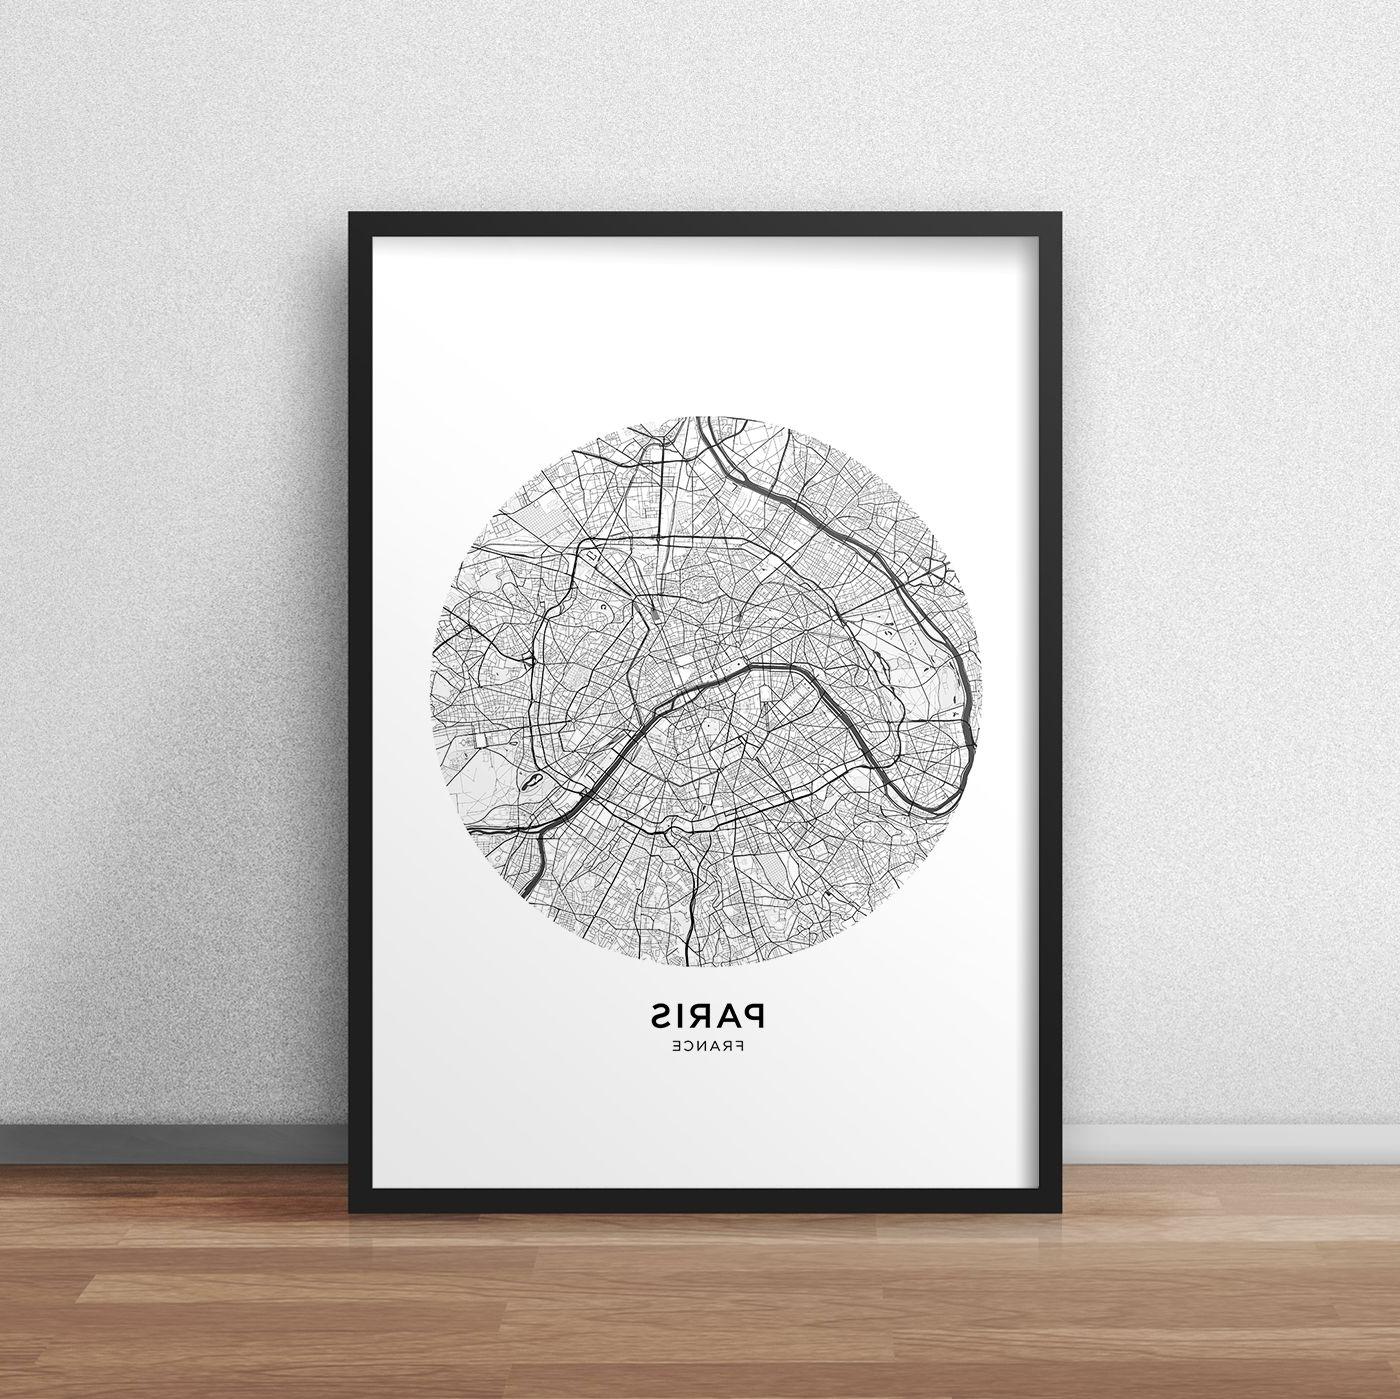 Well Known Paris Map Print, Paris Map Download, Circle City Map Paris, Paris Within Map Of Paris Wall Art (View 15 of 15)